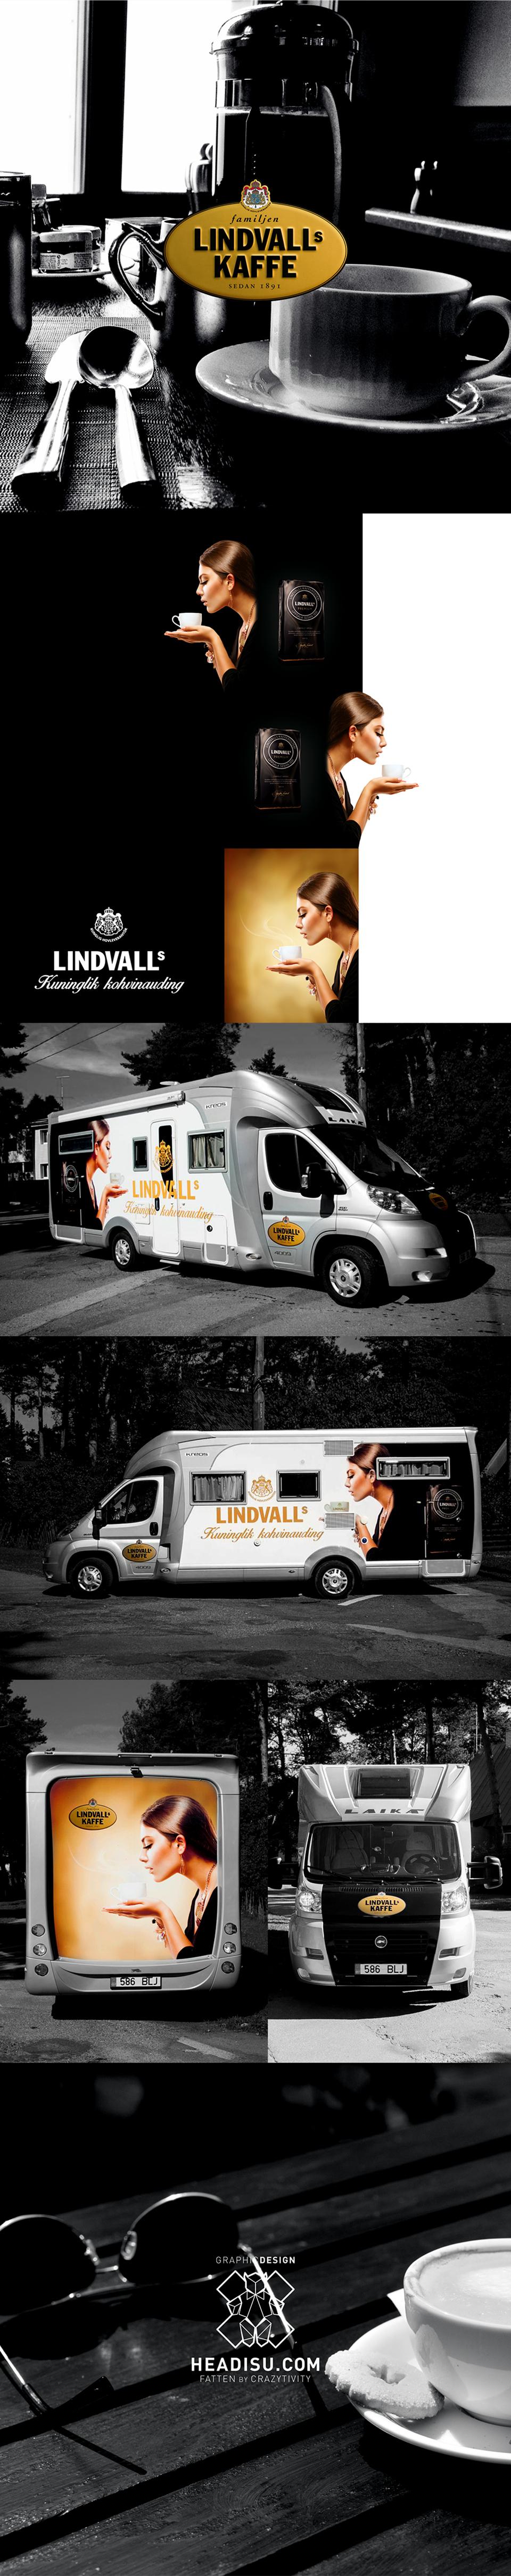 LindvallsAuto